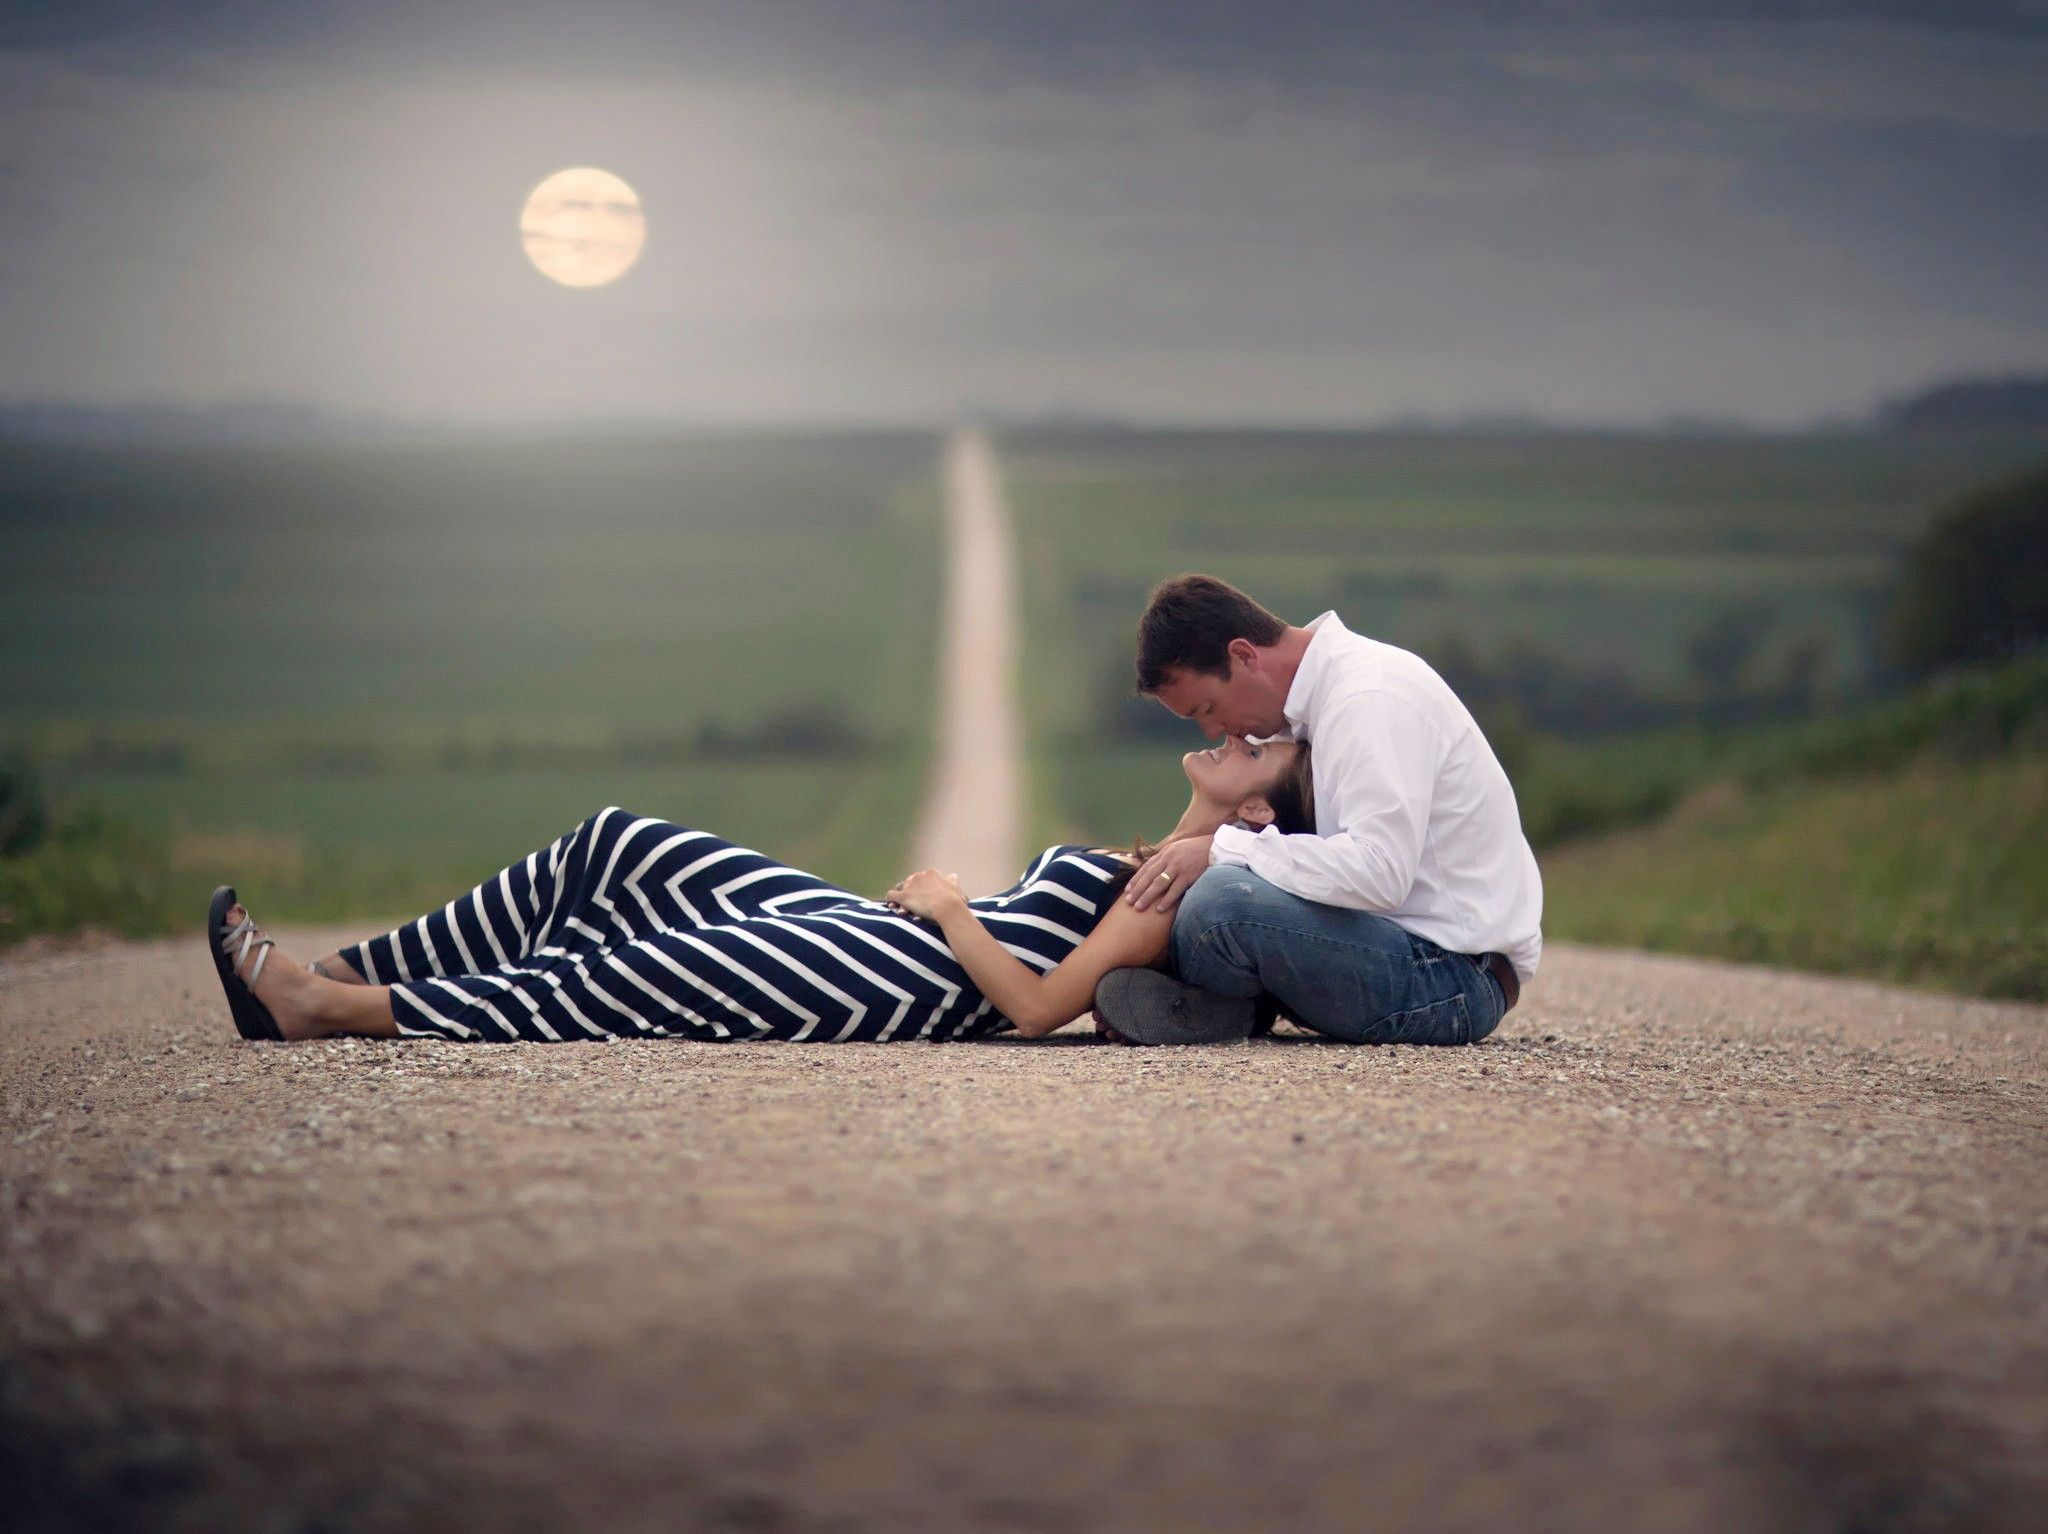 Straight Road Love Couple Wallpaper Couples Romantic Love